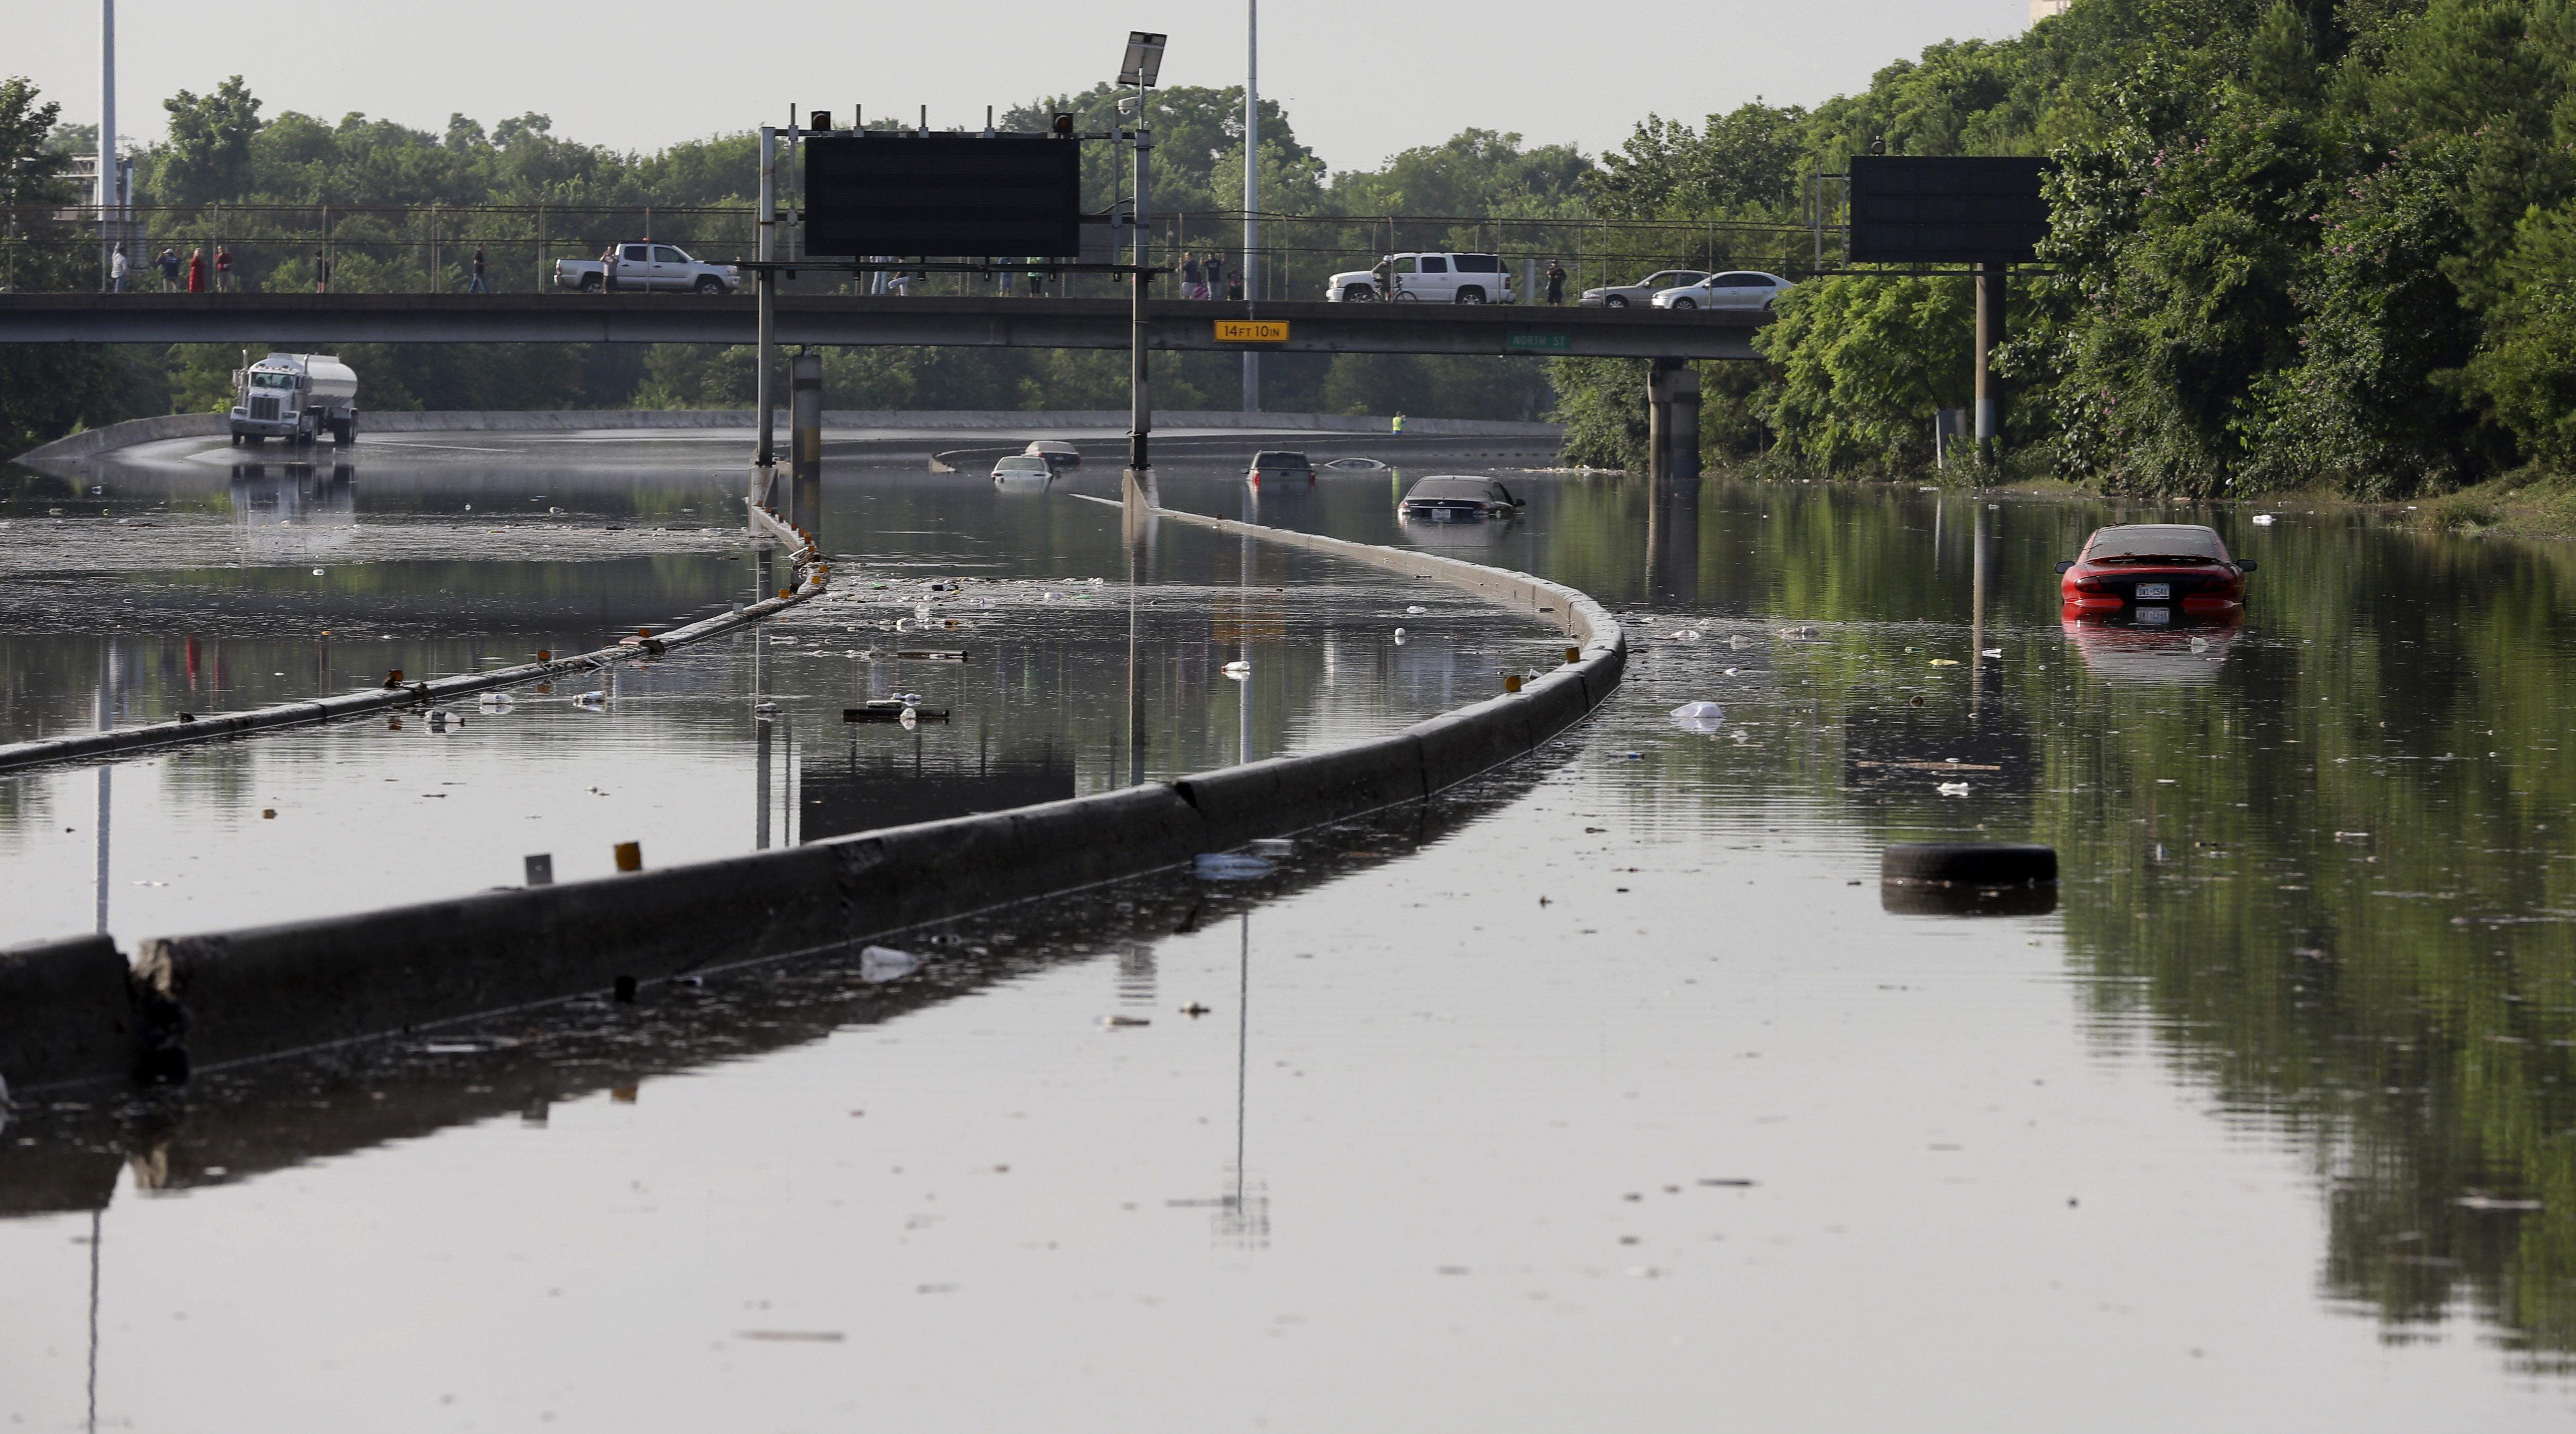 High tide: flash flooding ravages Texas